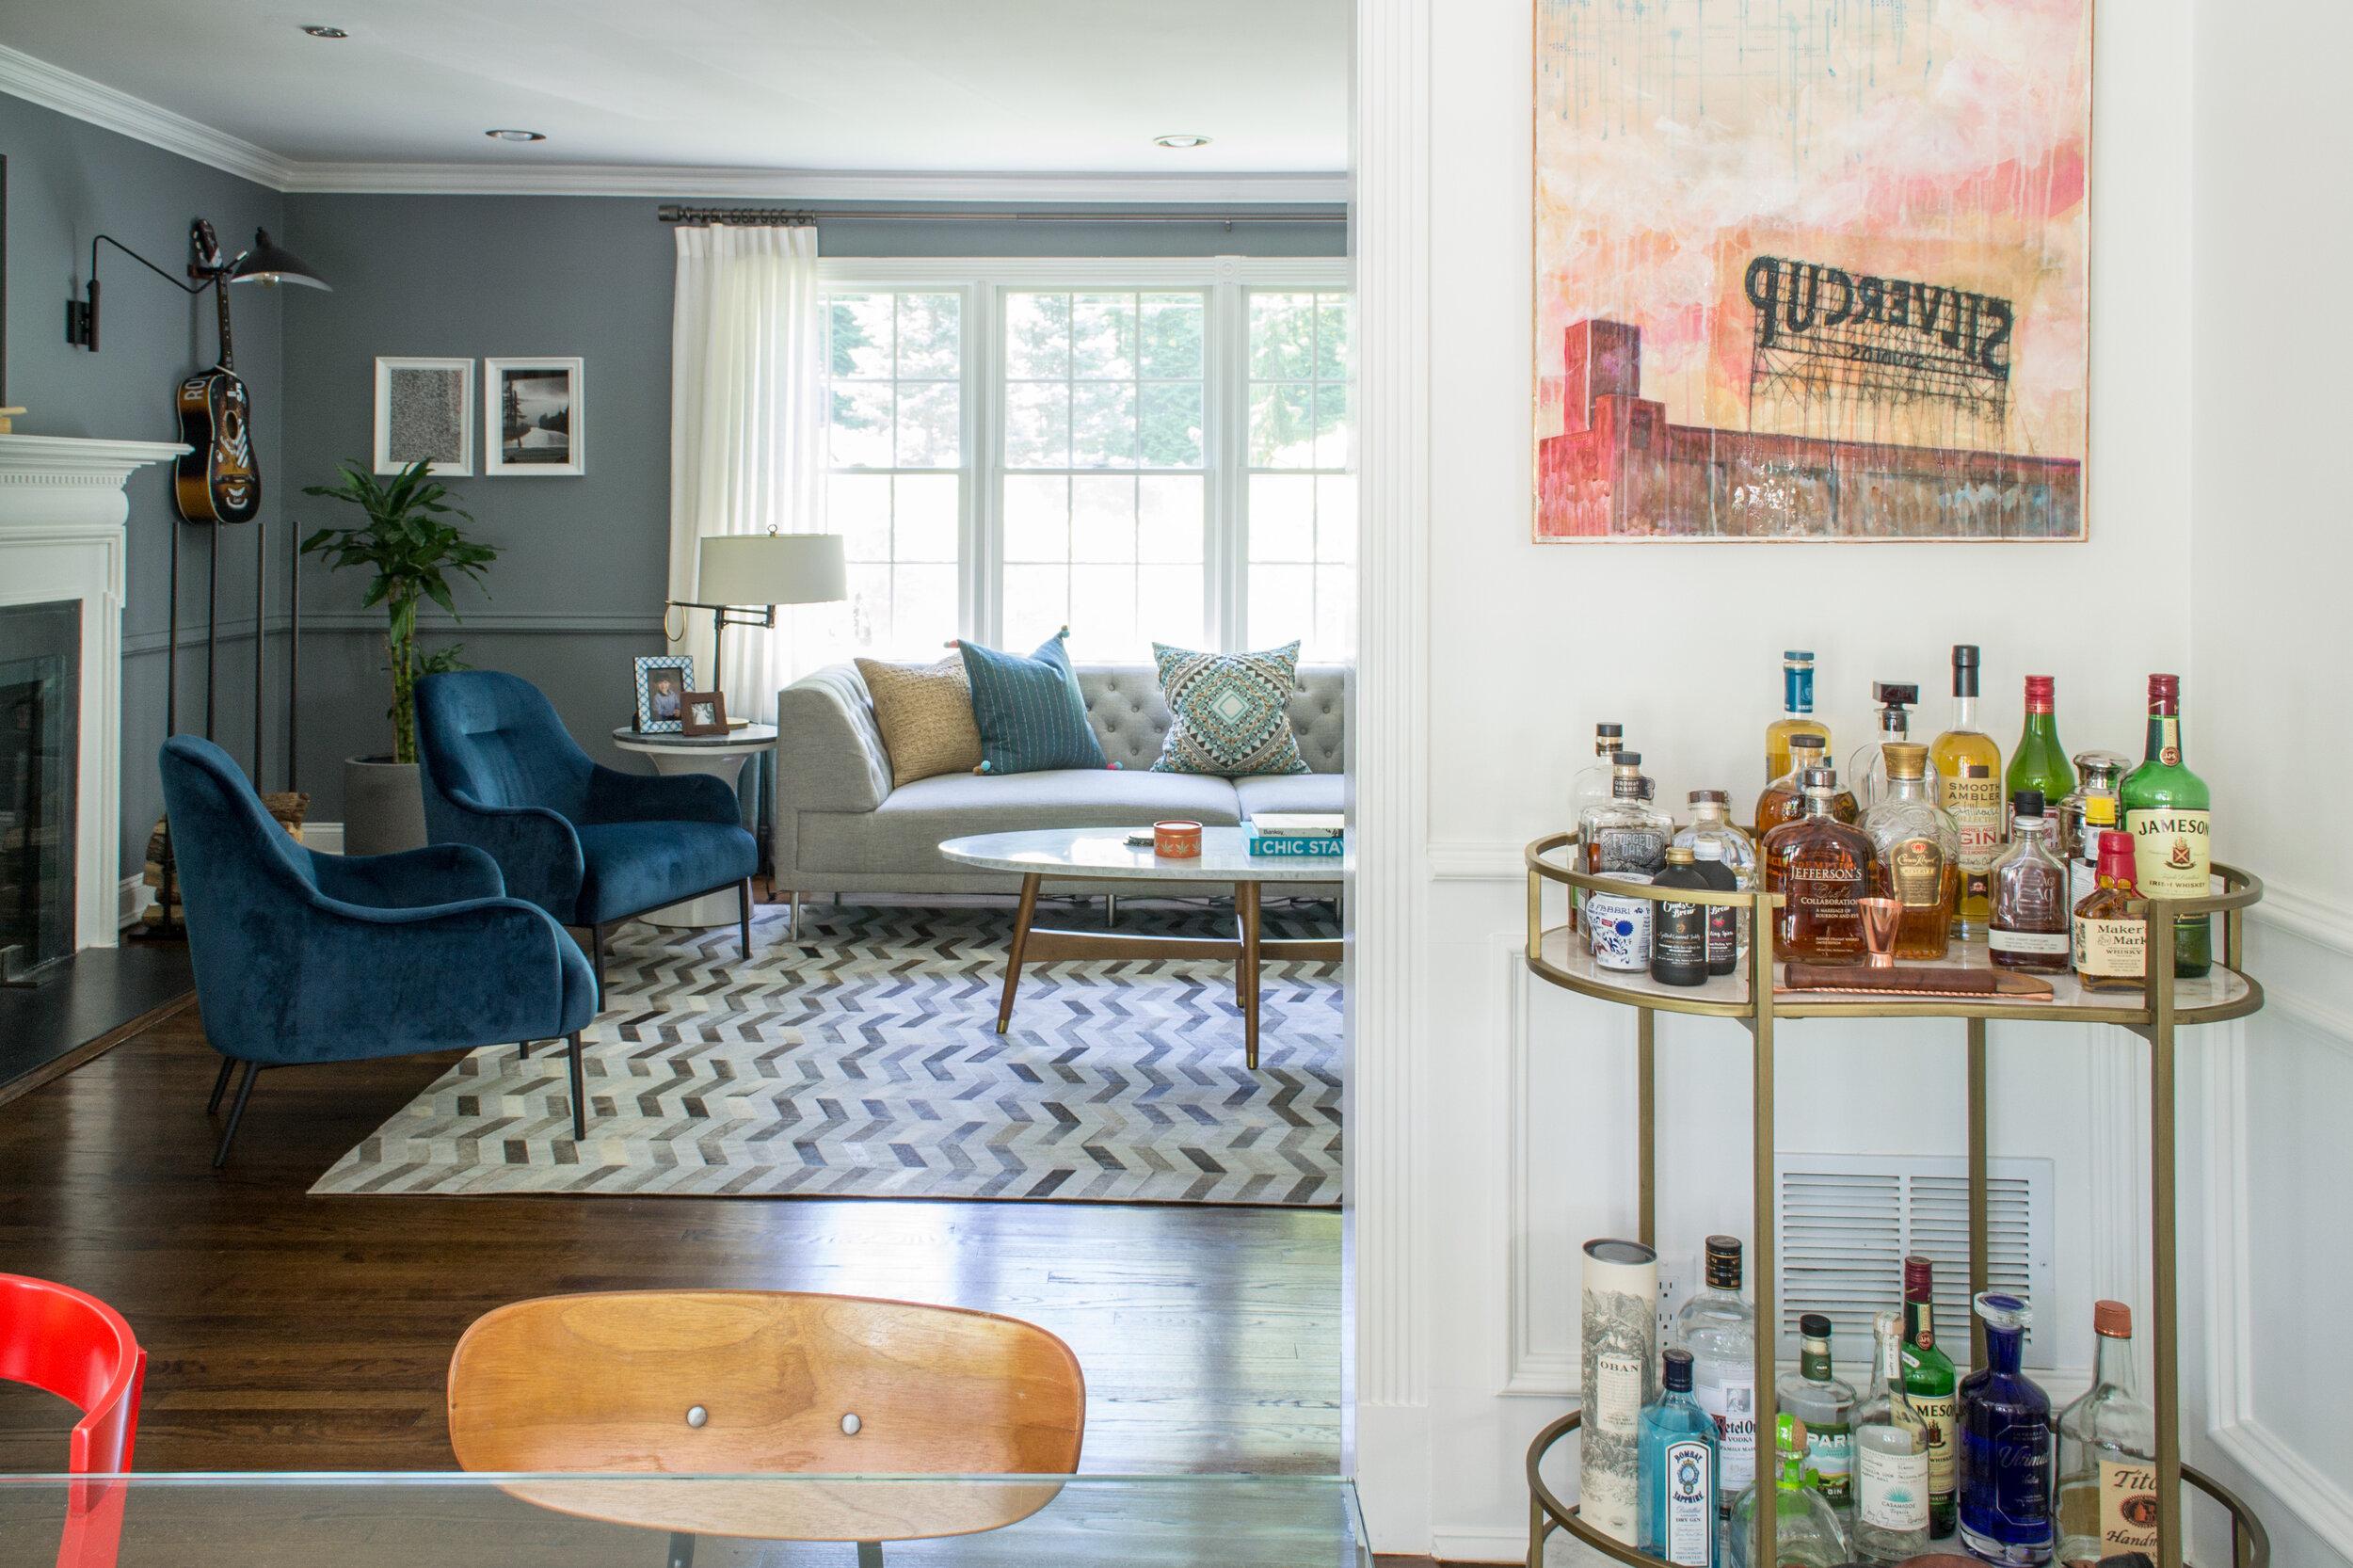 living-room-pop-of-color-tc-interiors-6.jpg